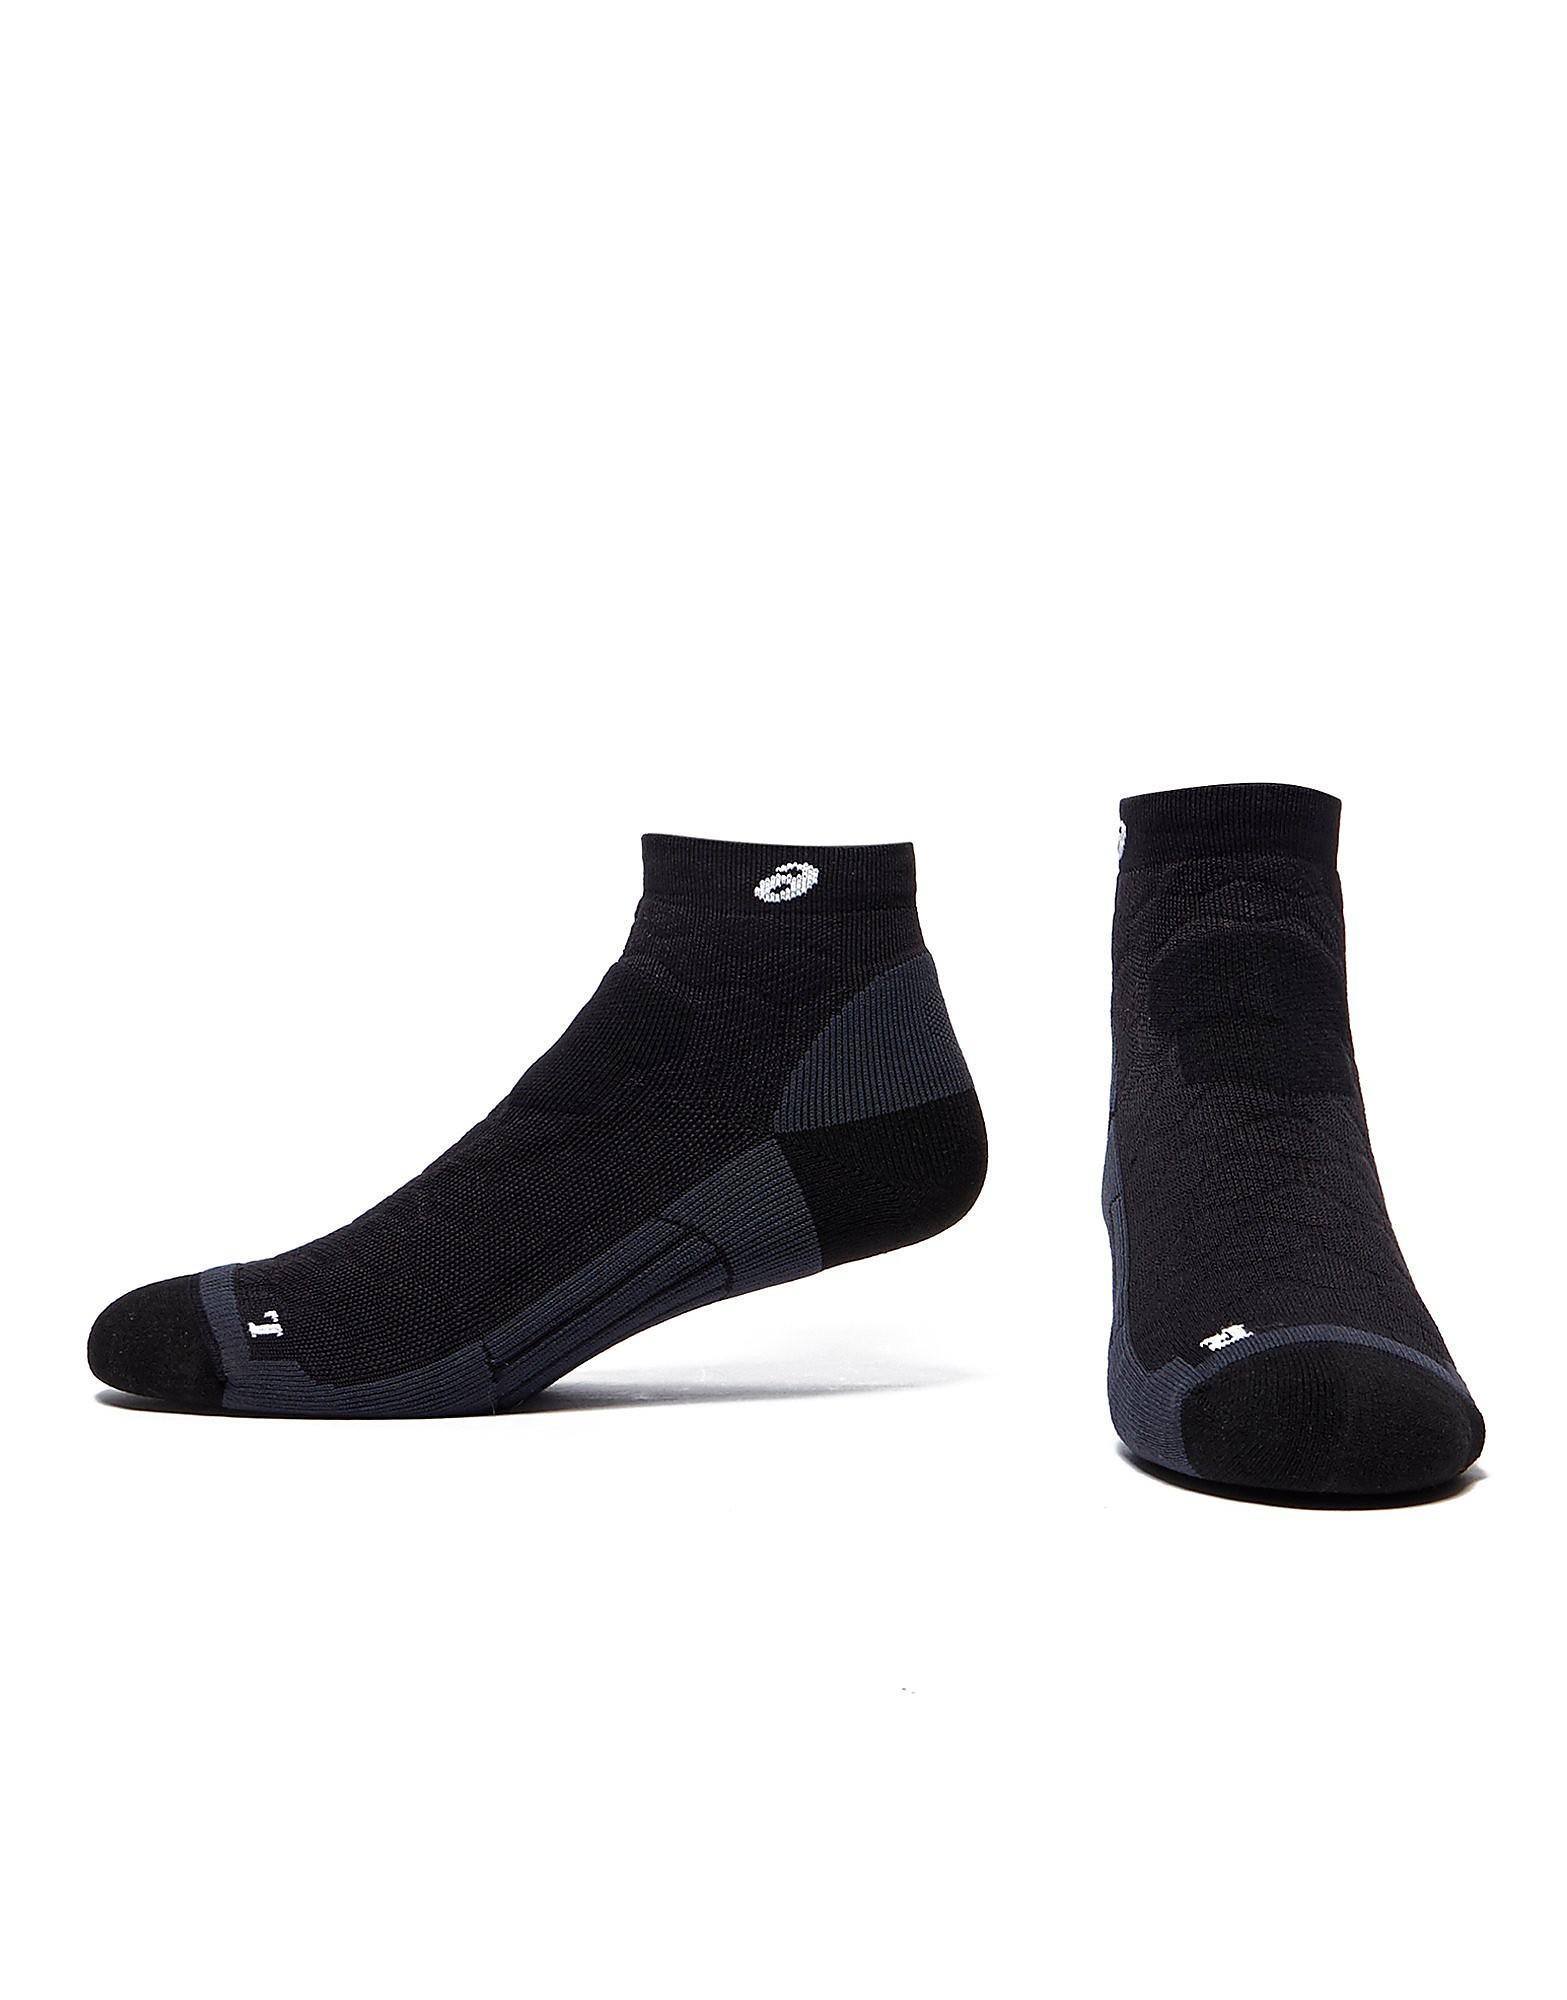 ASICS Road Quarter Running Socks